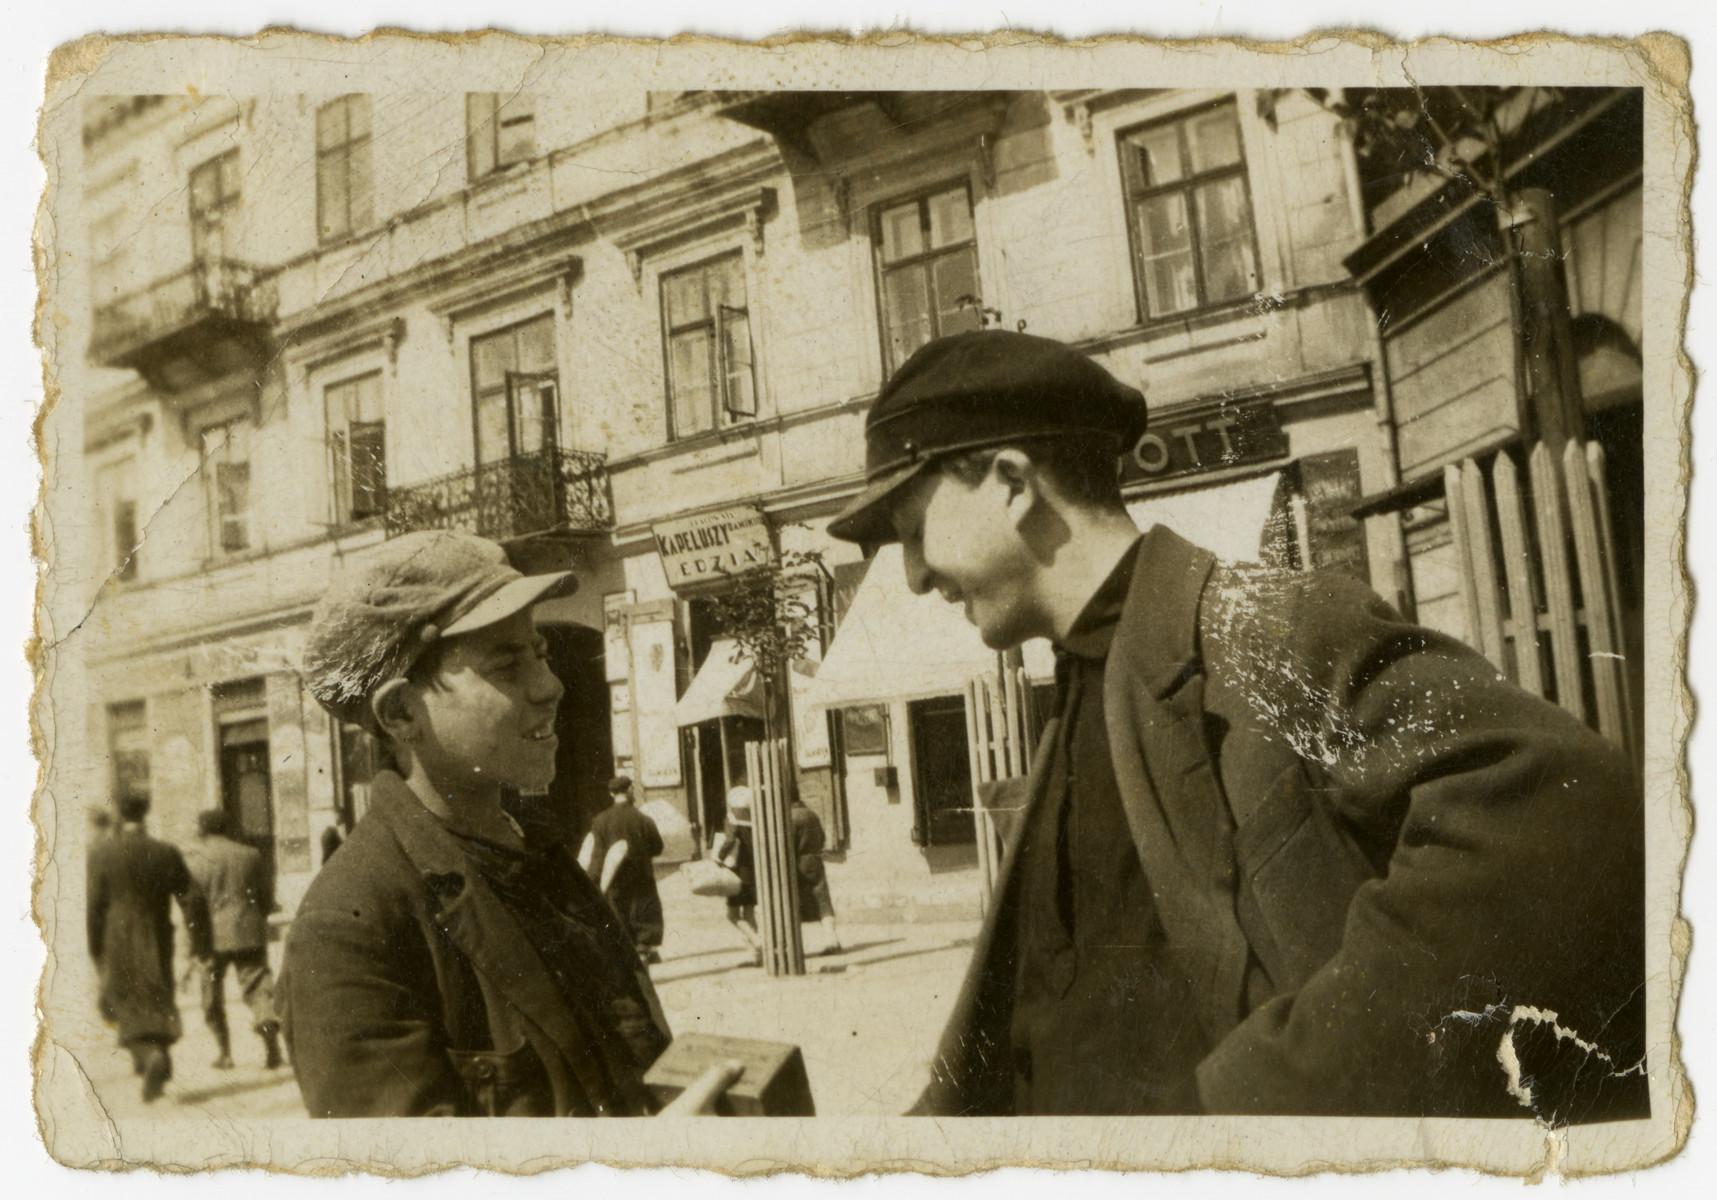 Mendel Grosman (right) talks to a friend on a street in Lodz.